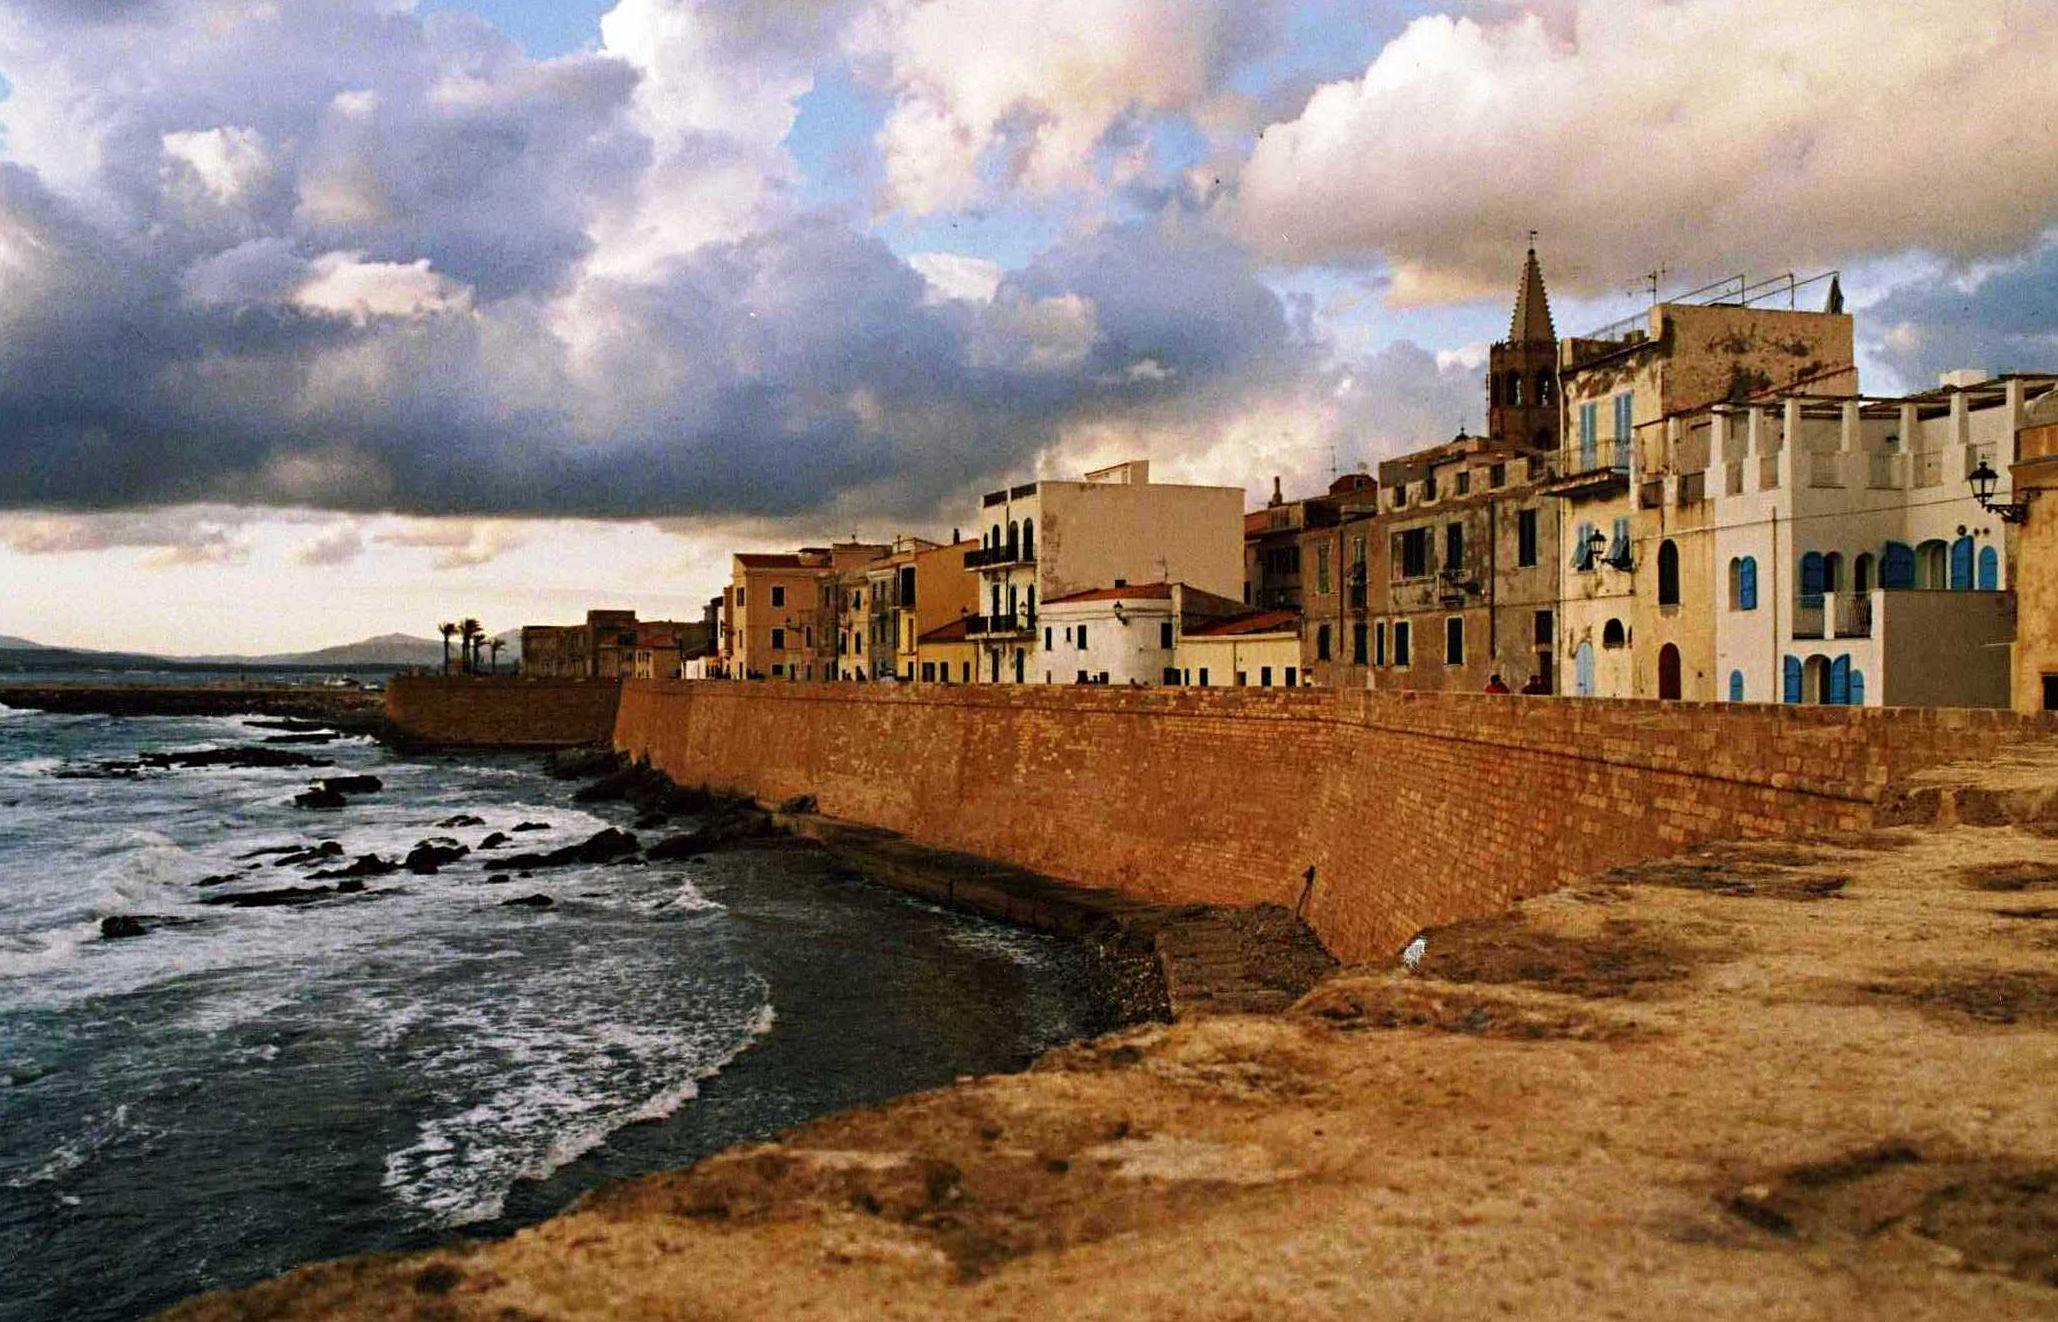 city in Sardinia, Alghero